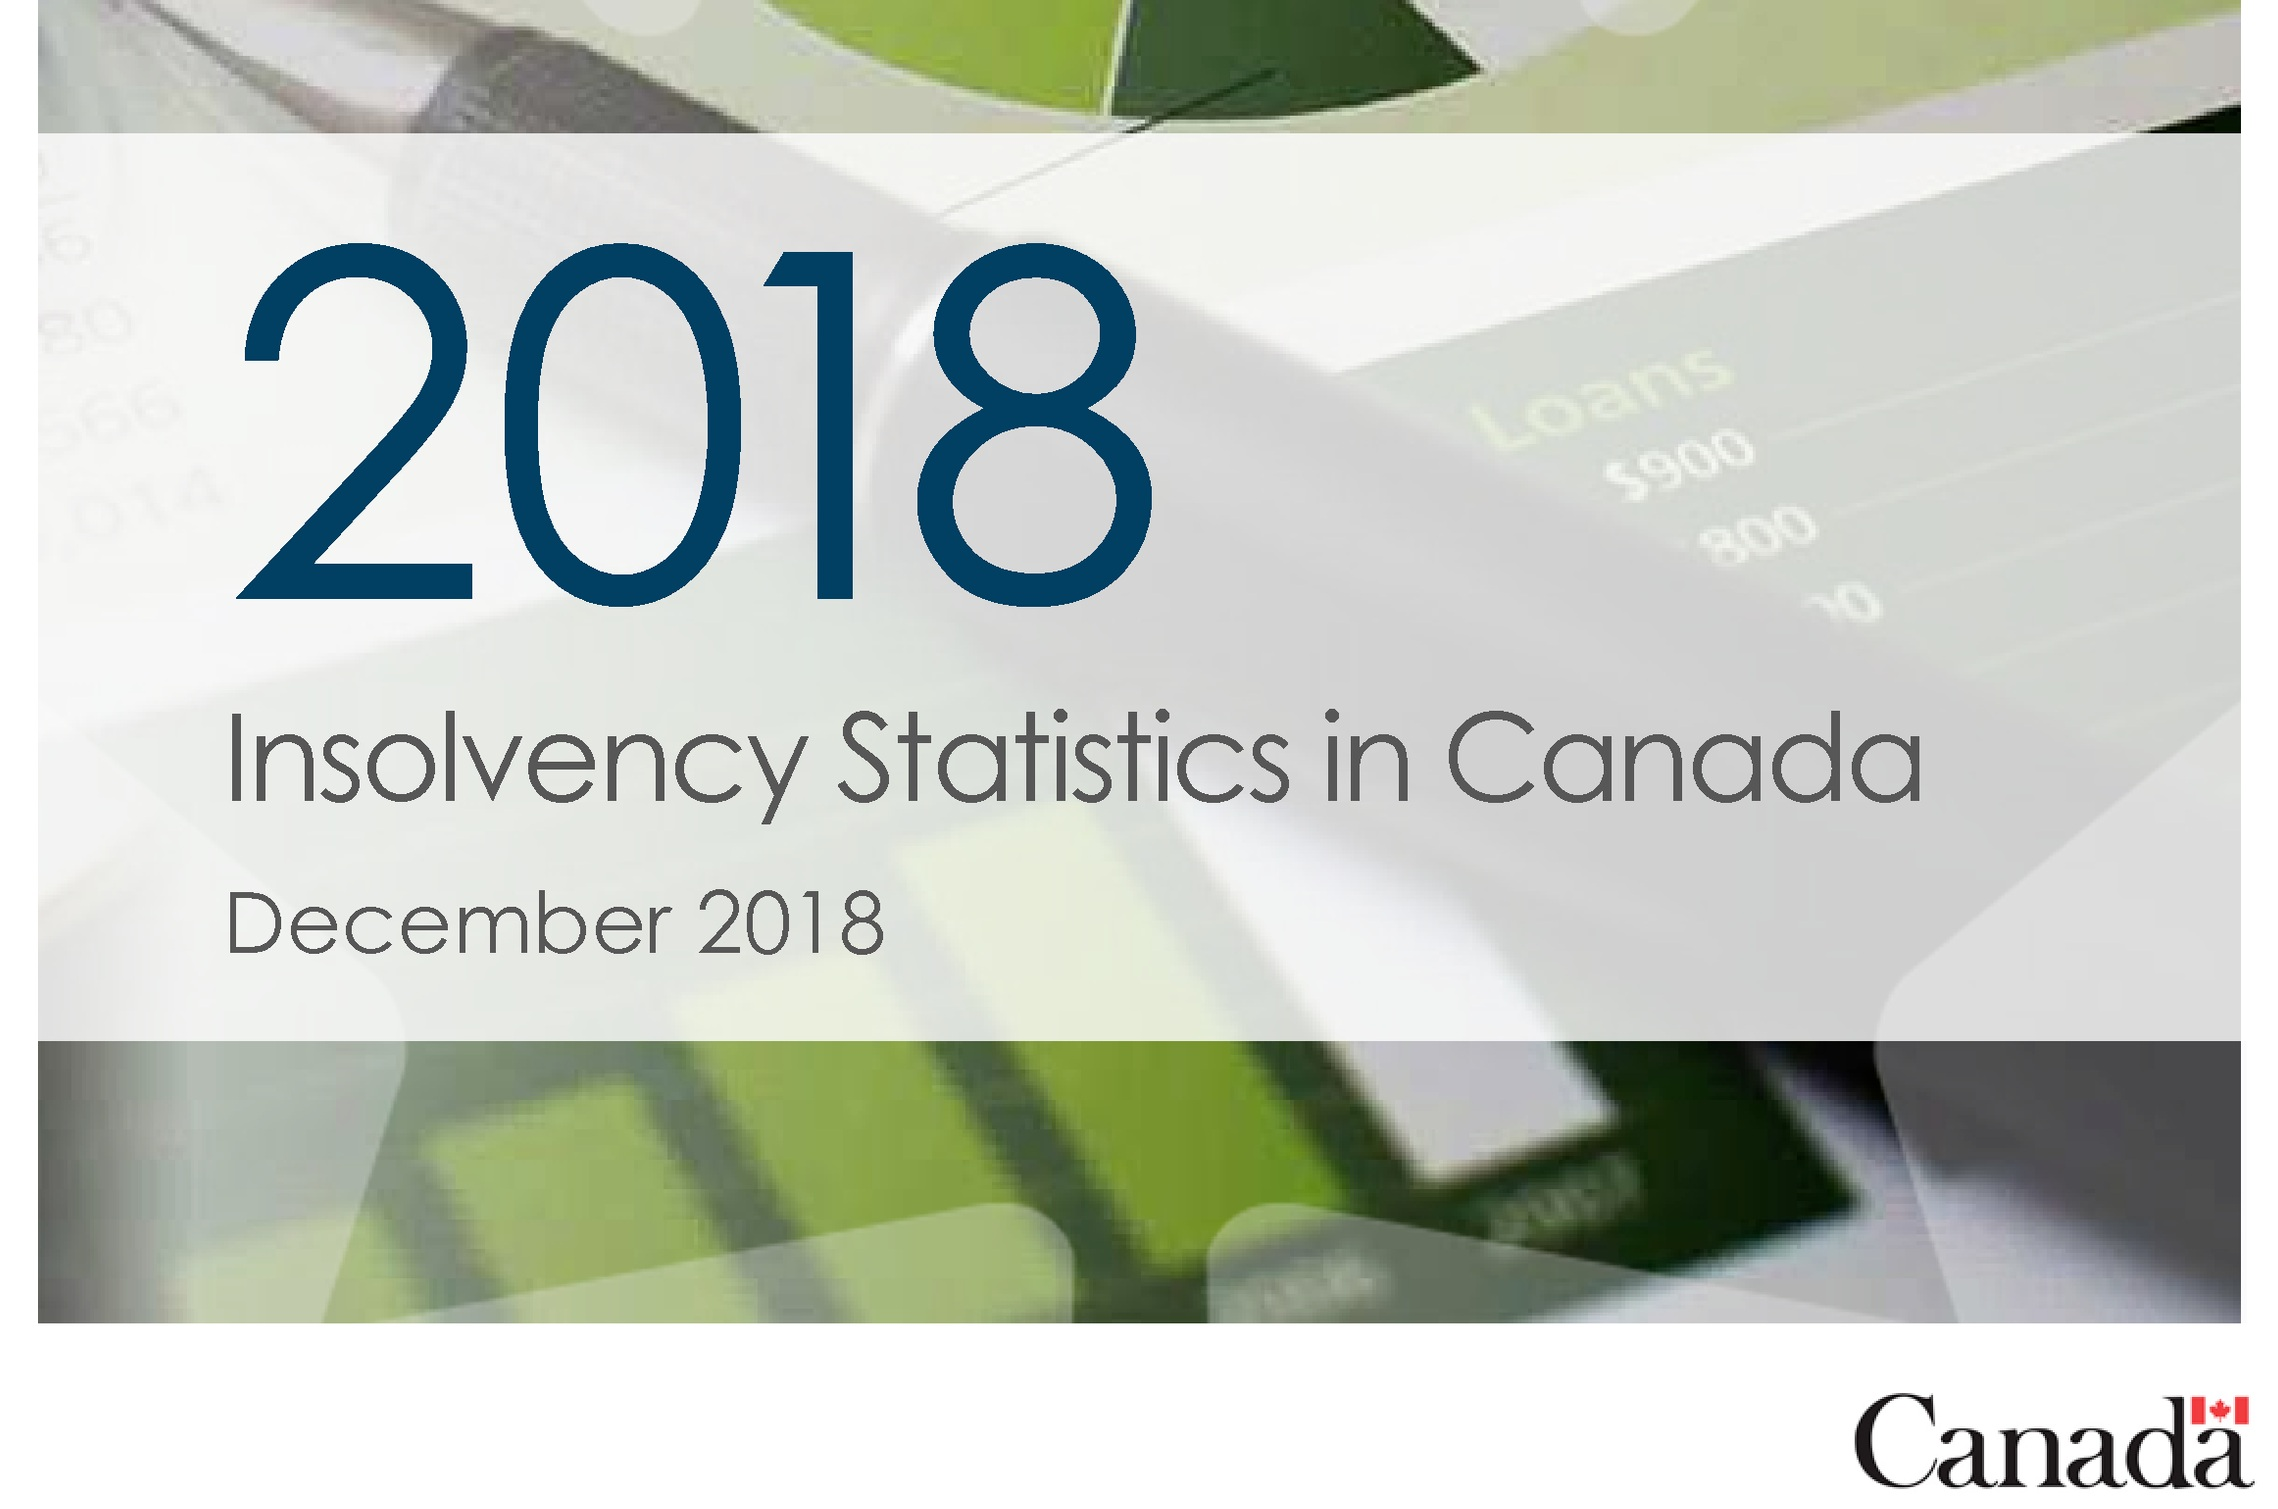 Action statistics pdf in